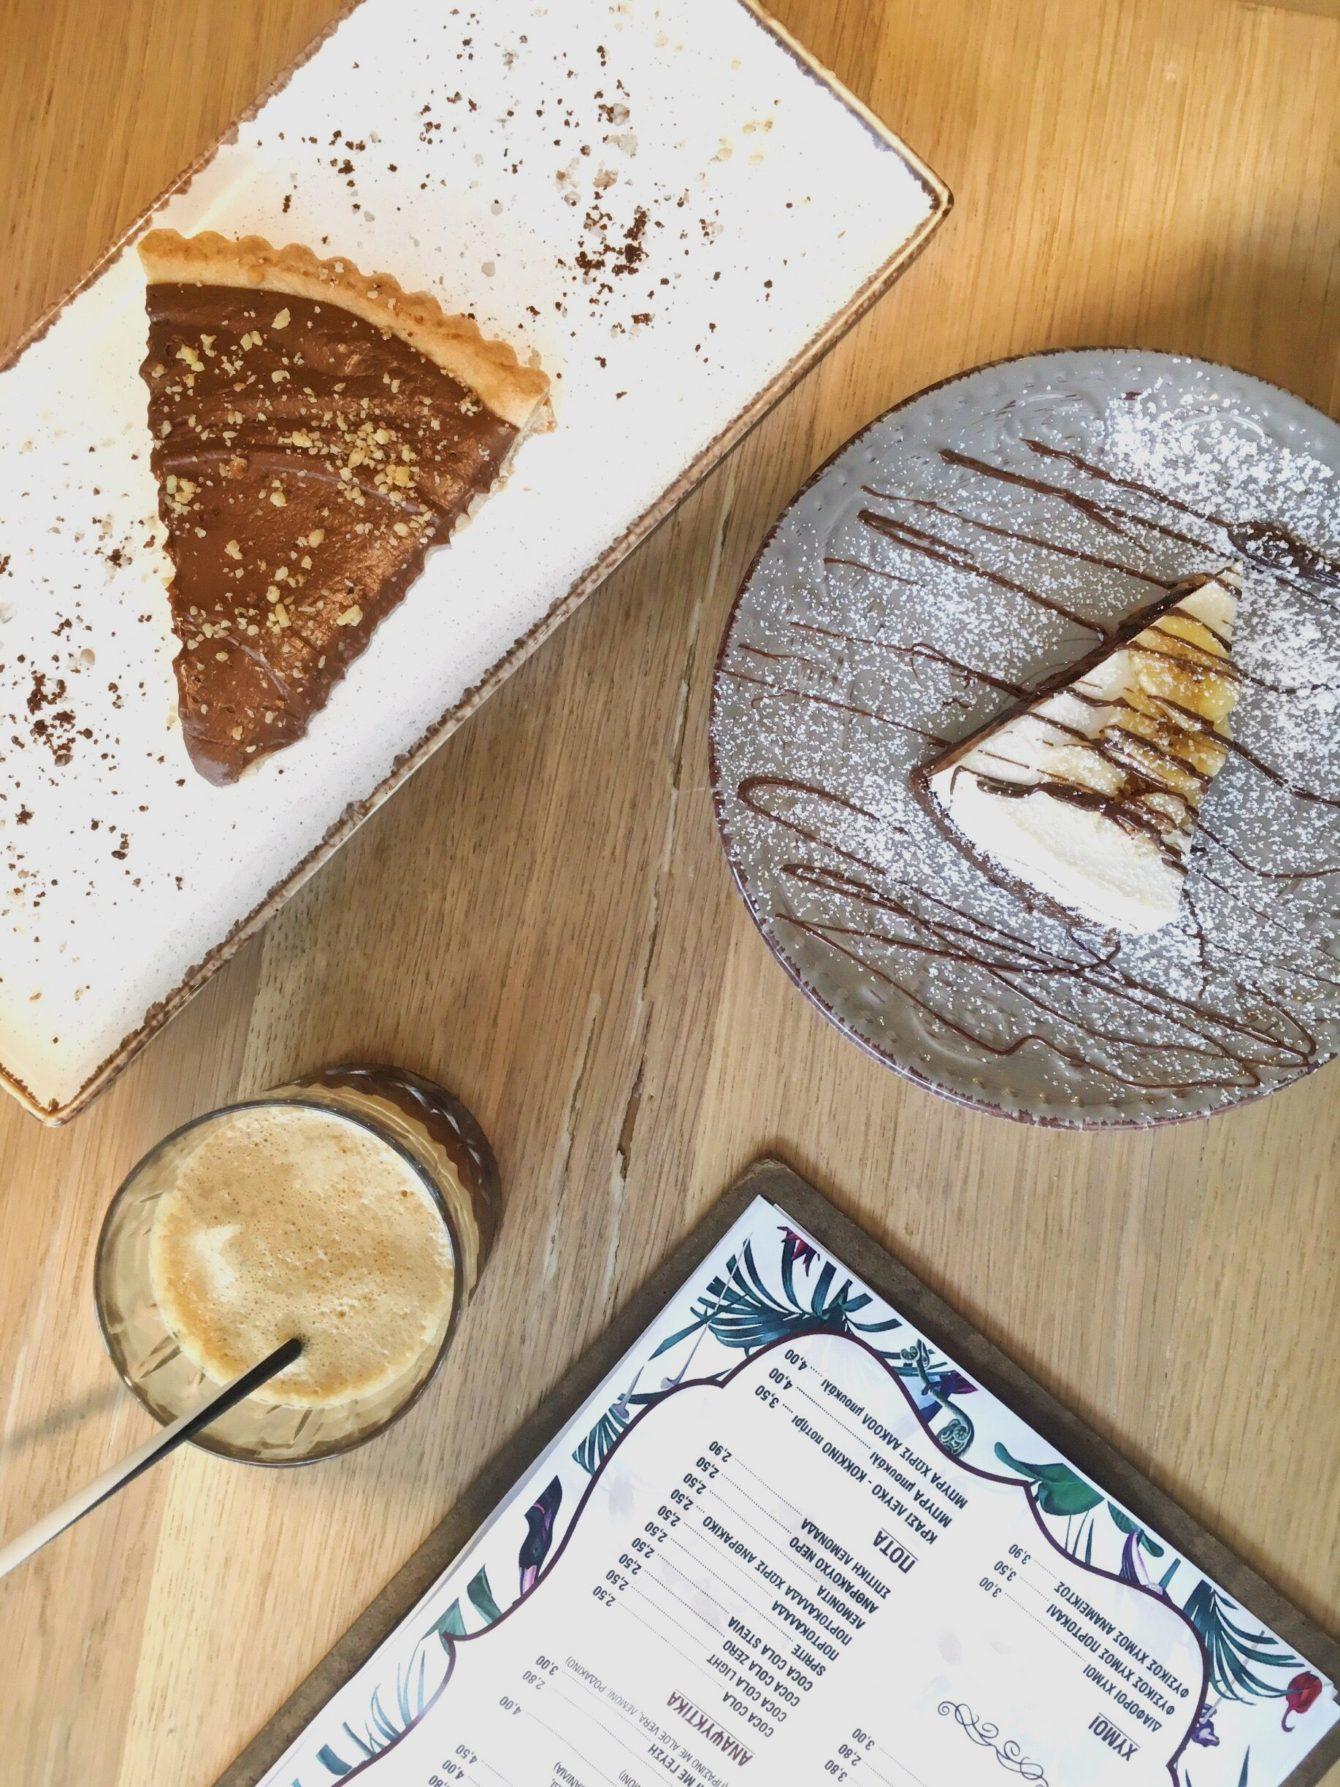 Maple sugar & spice: Για γλυκές απολαύσεις!